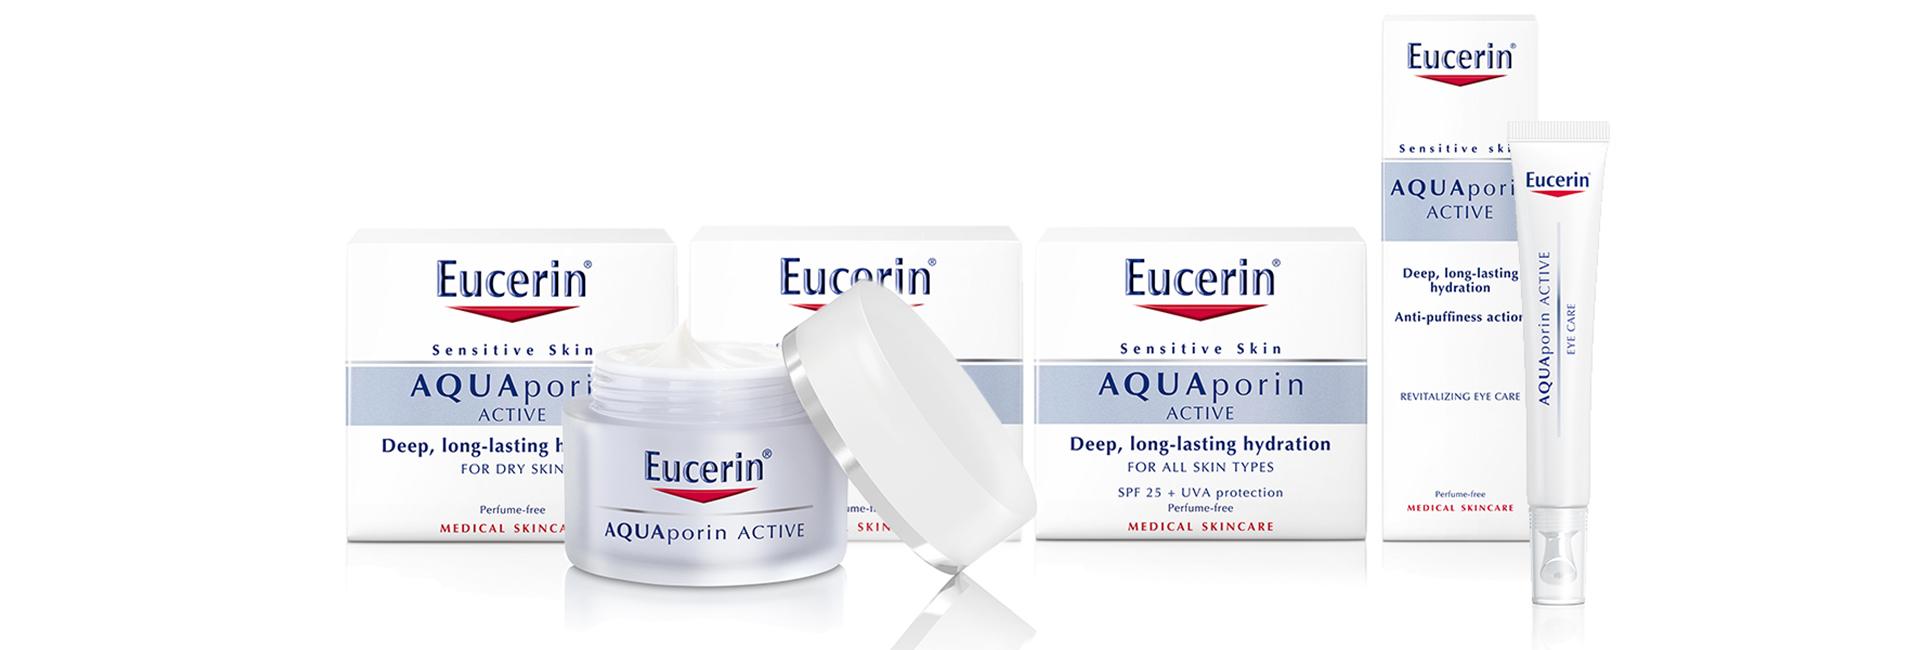 aquaporine-gamme-eucerin-blog-beaute-soin-parfum-homme